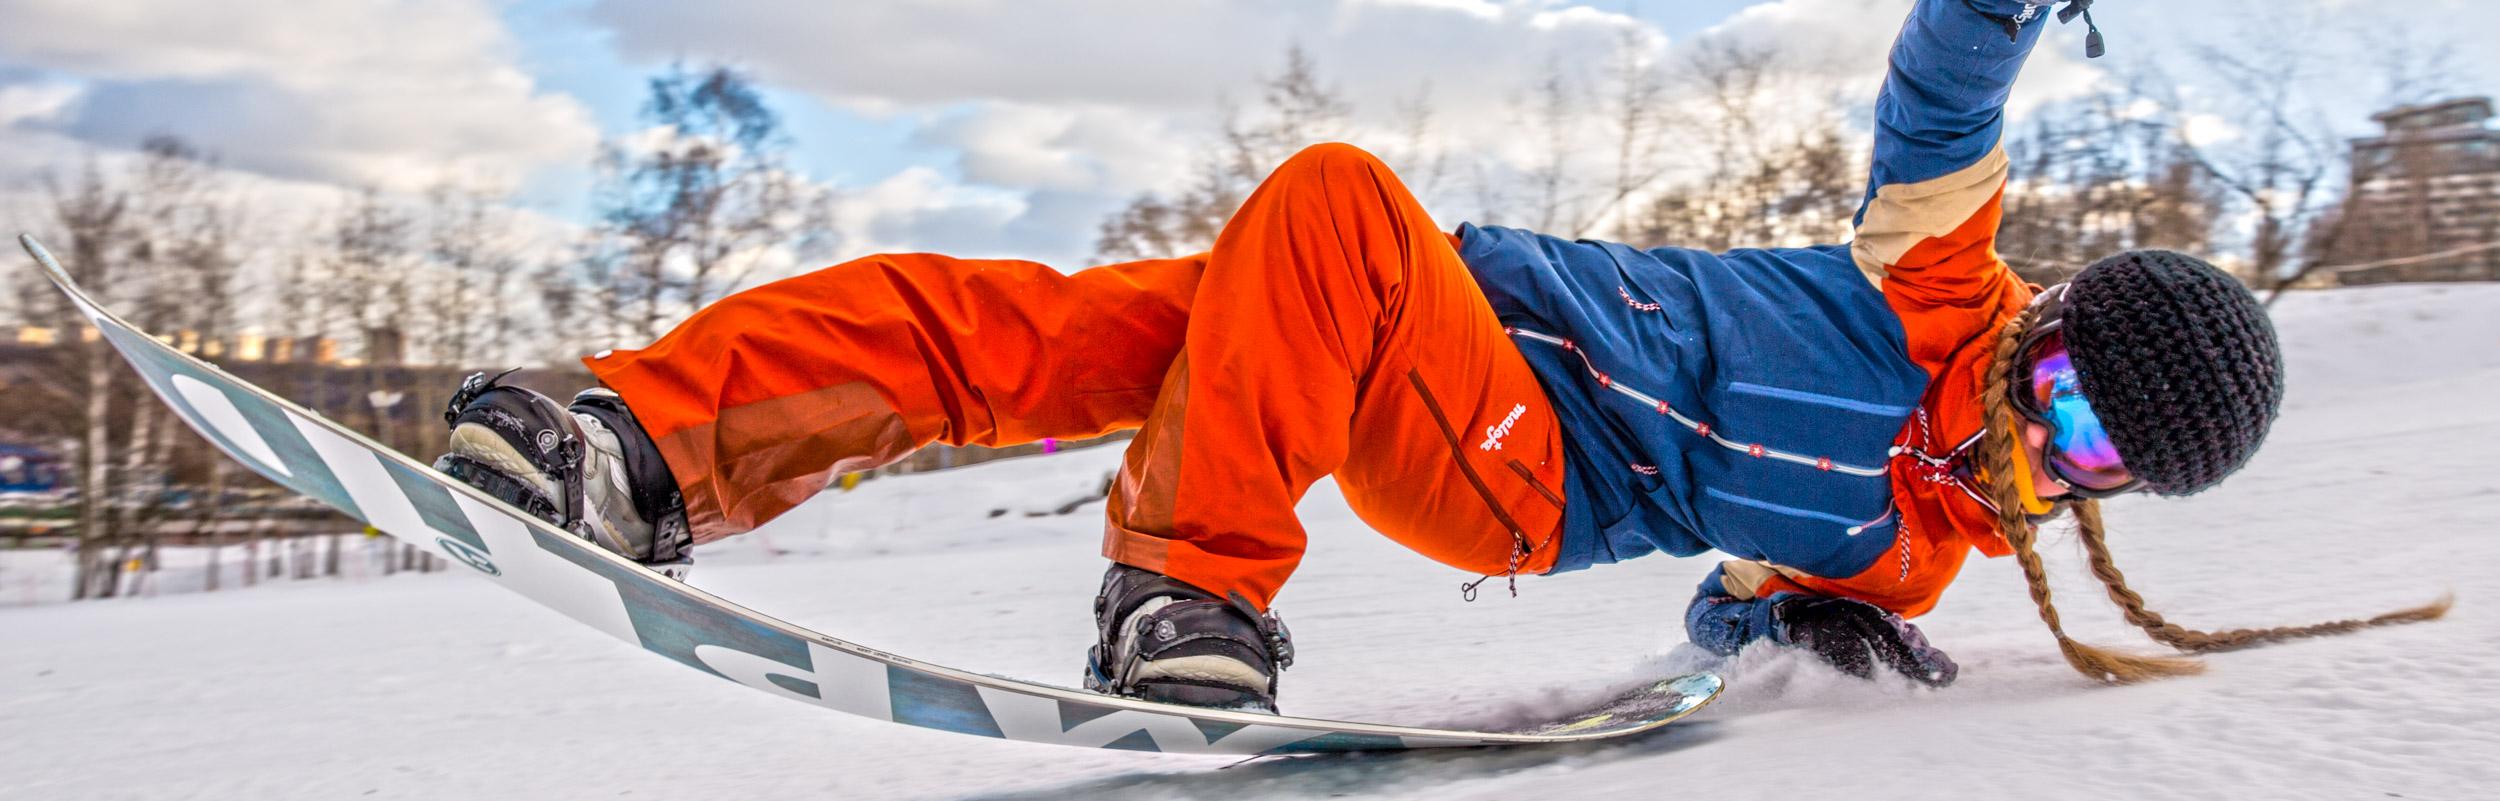 Картинки приколы сноуборд